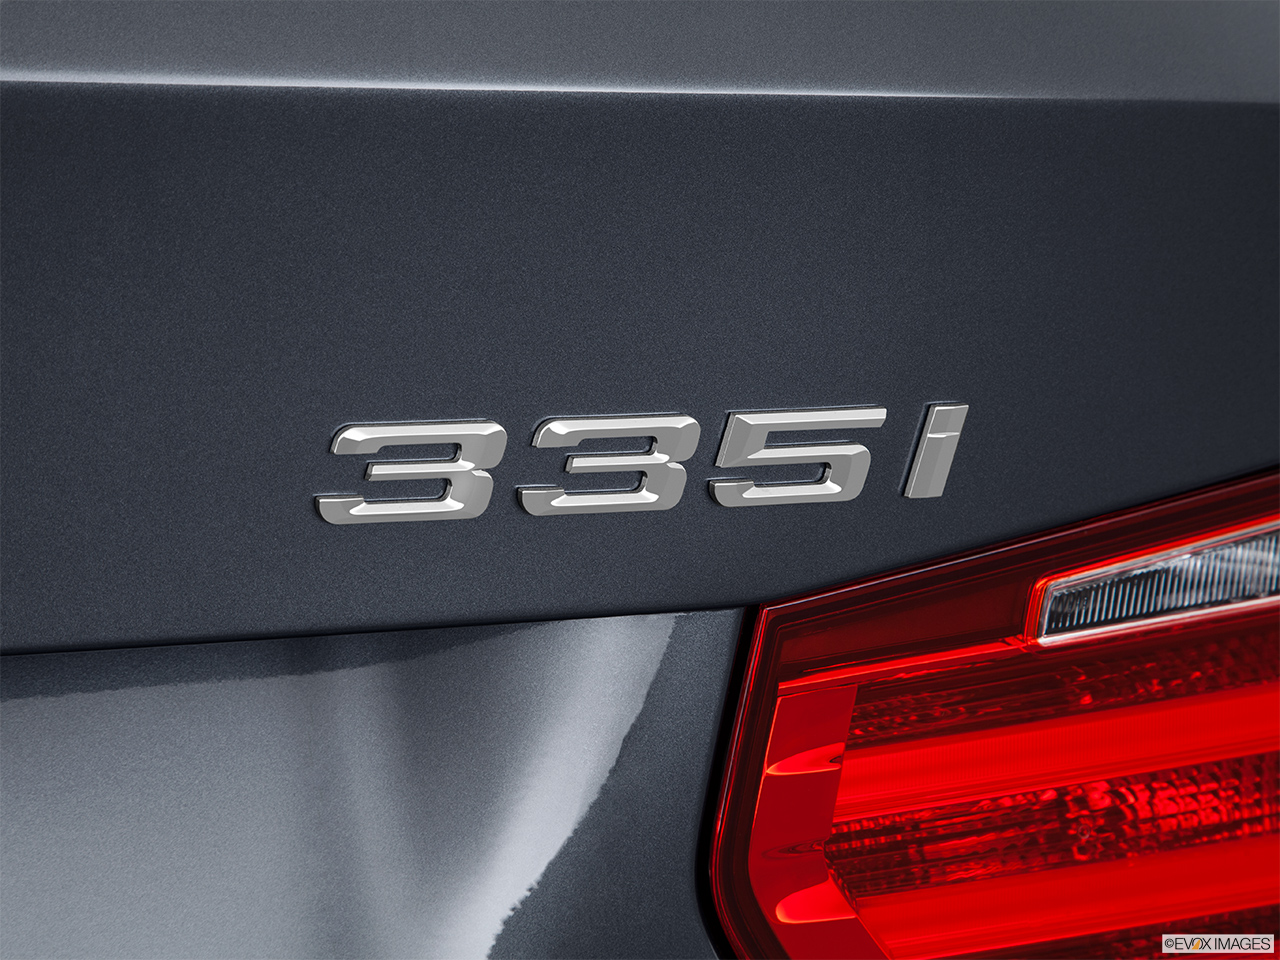 2015 Bmw 3 Series Sedan 335i Xdrive Awd Rear Model Badge